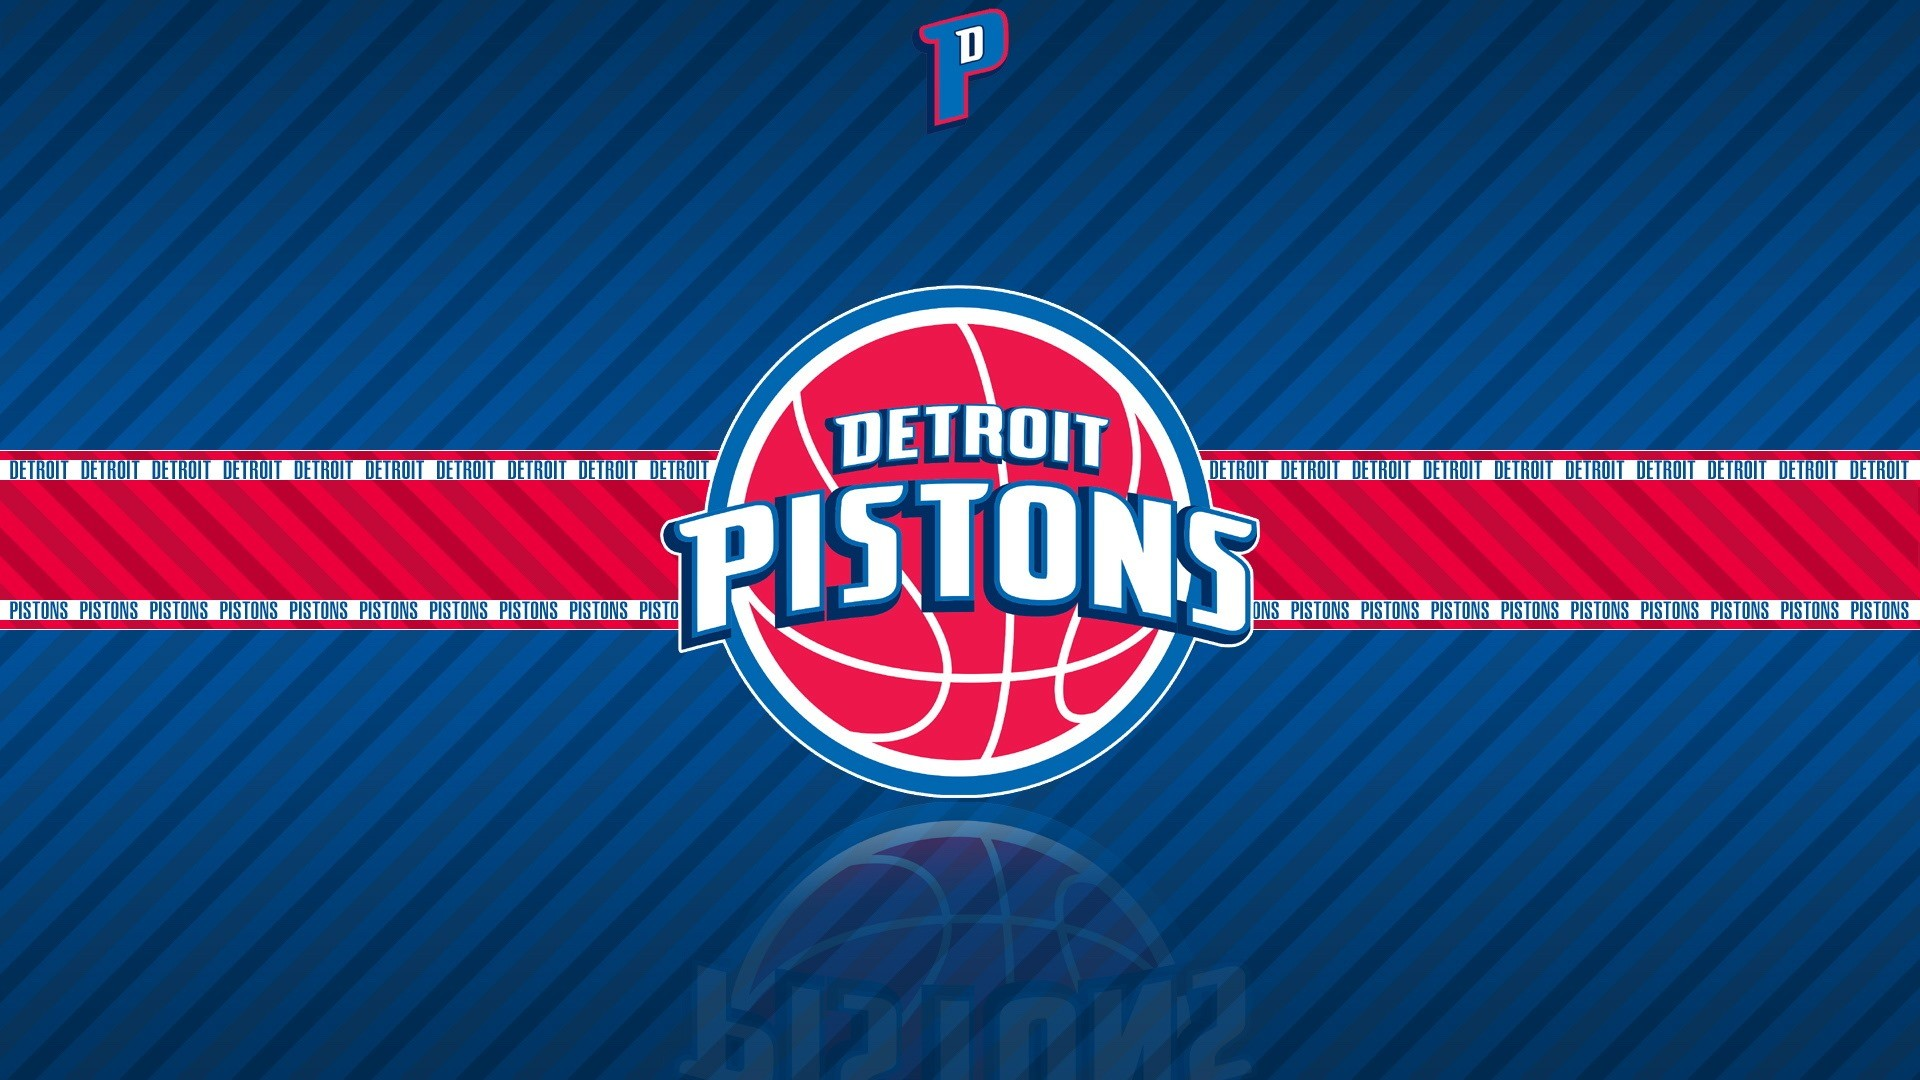 Detroit-pistons-logo-wallpaper-and-desktop-background-in-